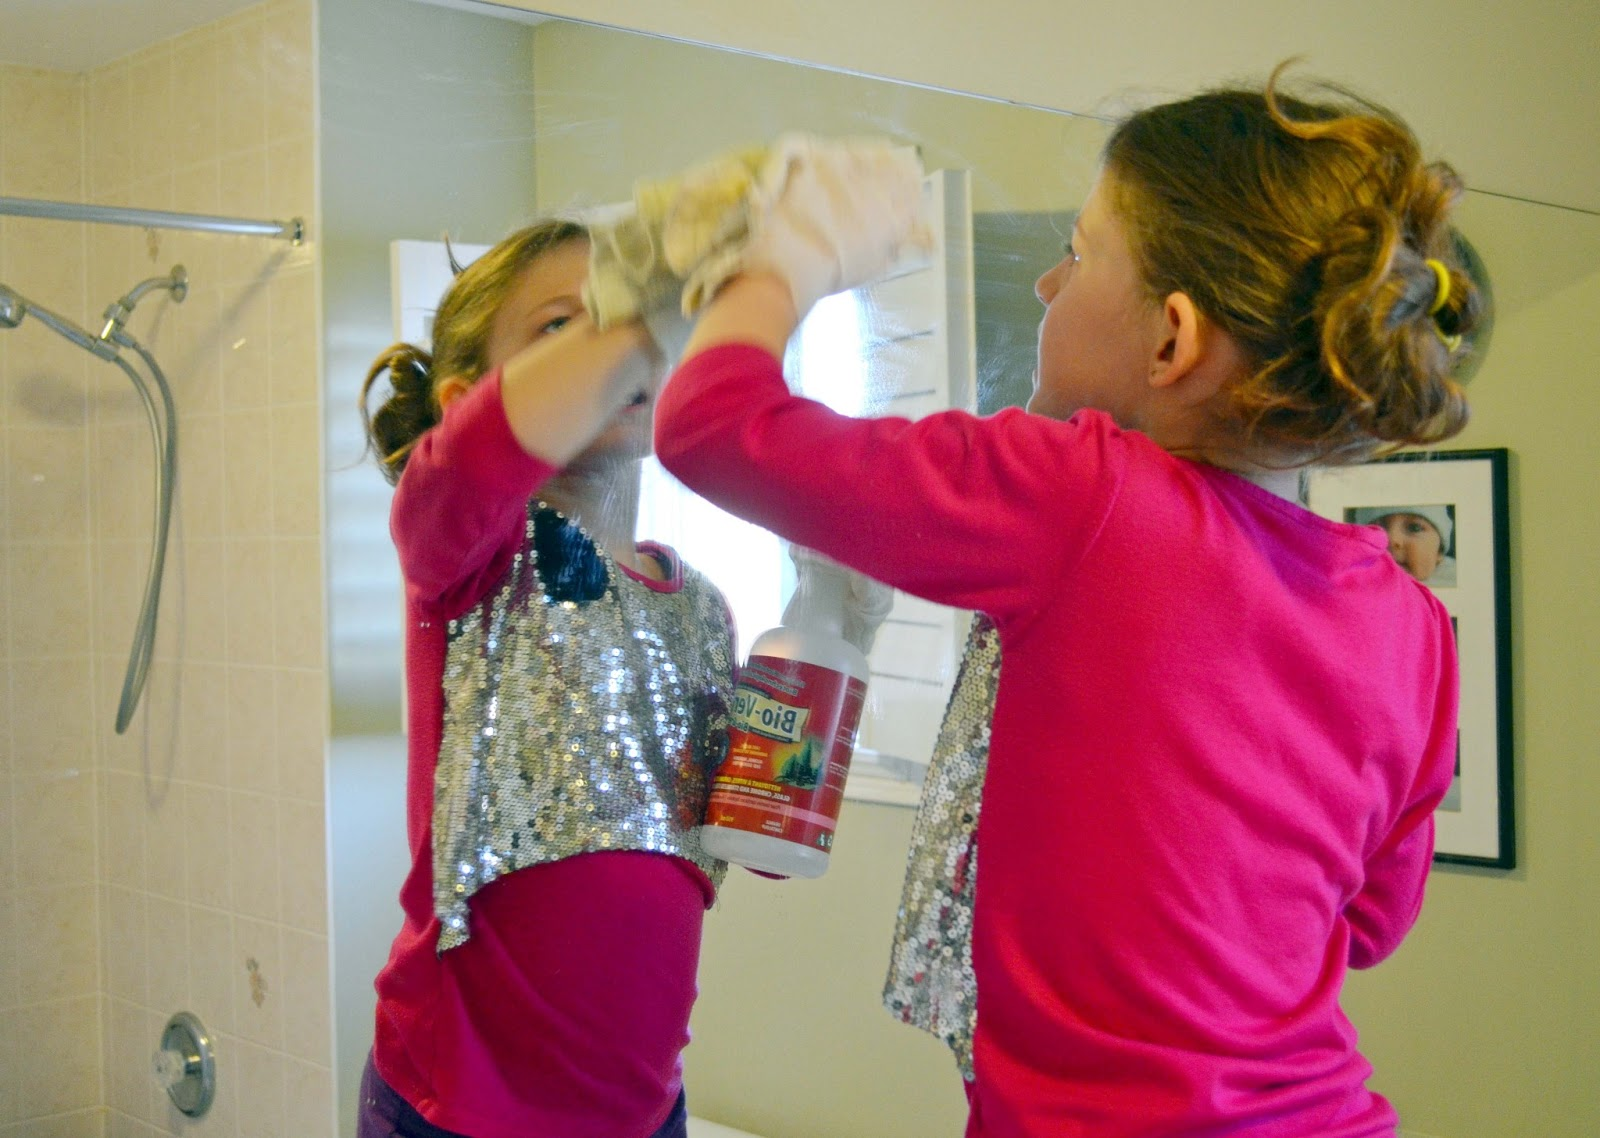 Kids can clean the bathrooms - Teaching Children To Clean